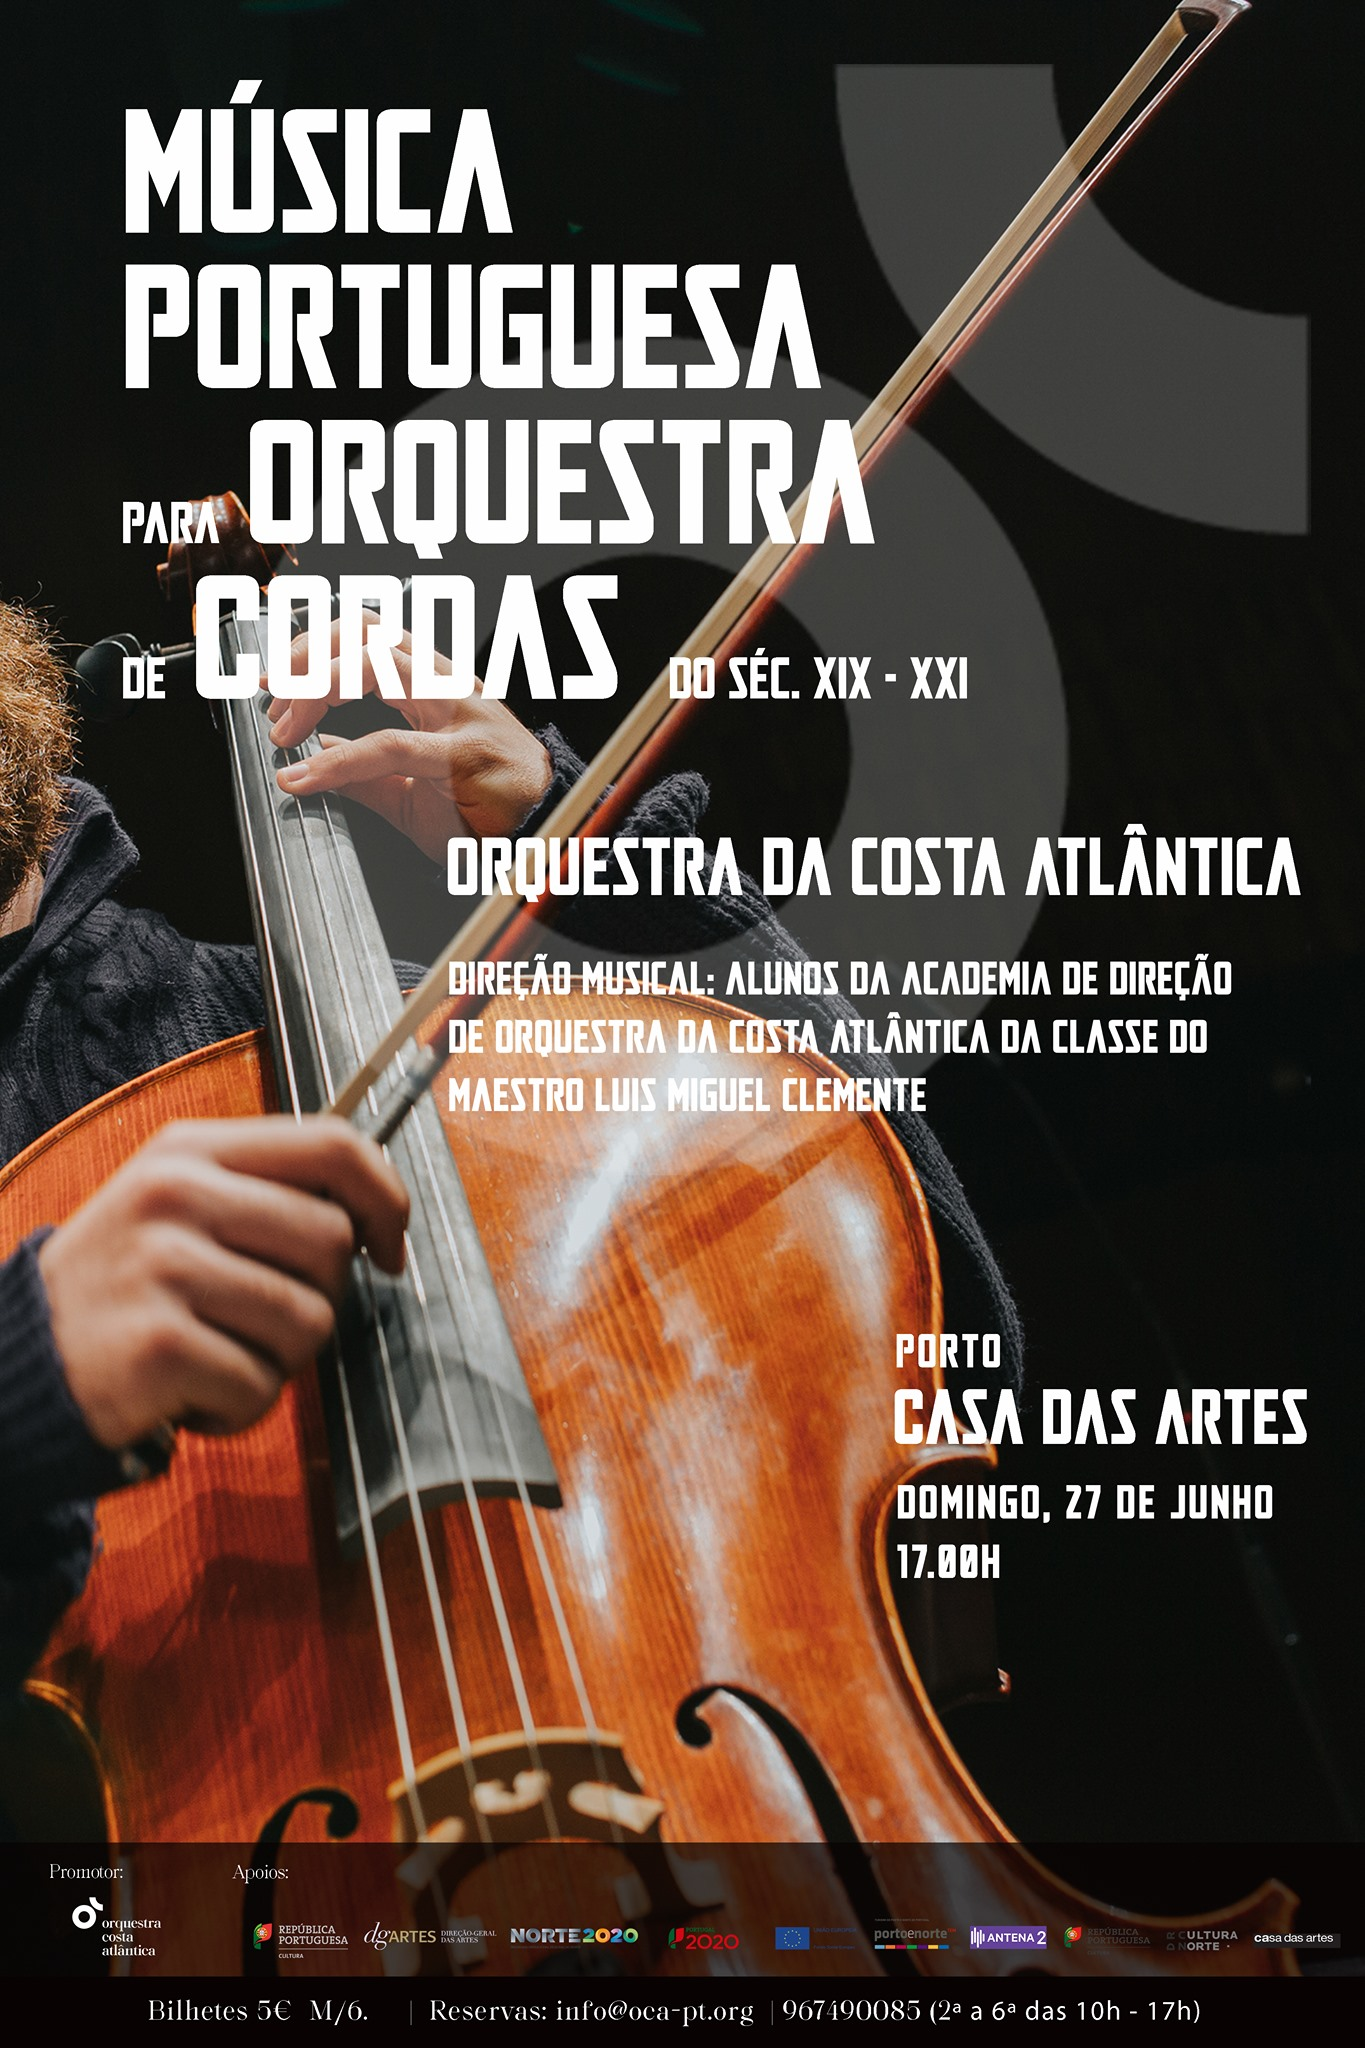 Música Portuguesa para Orquestra de Cordas do séc. XIX-XXI